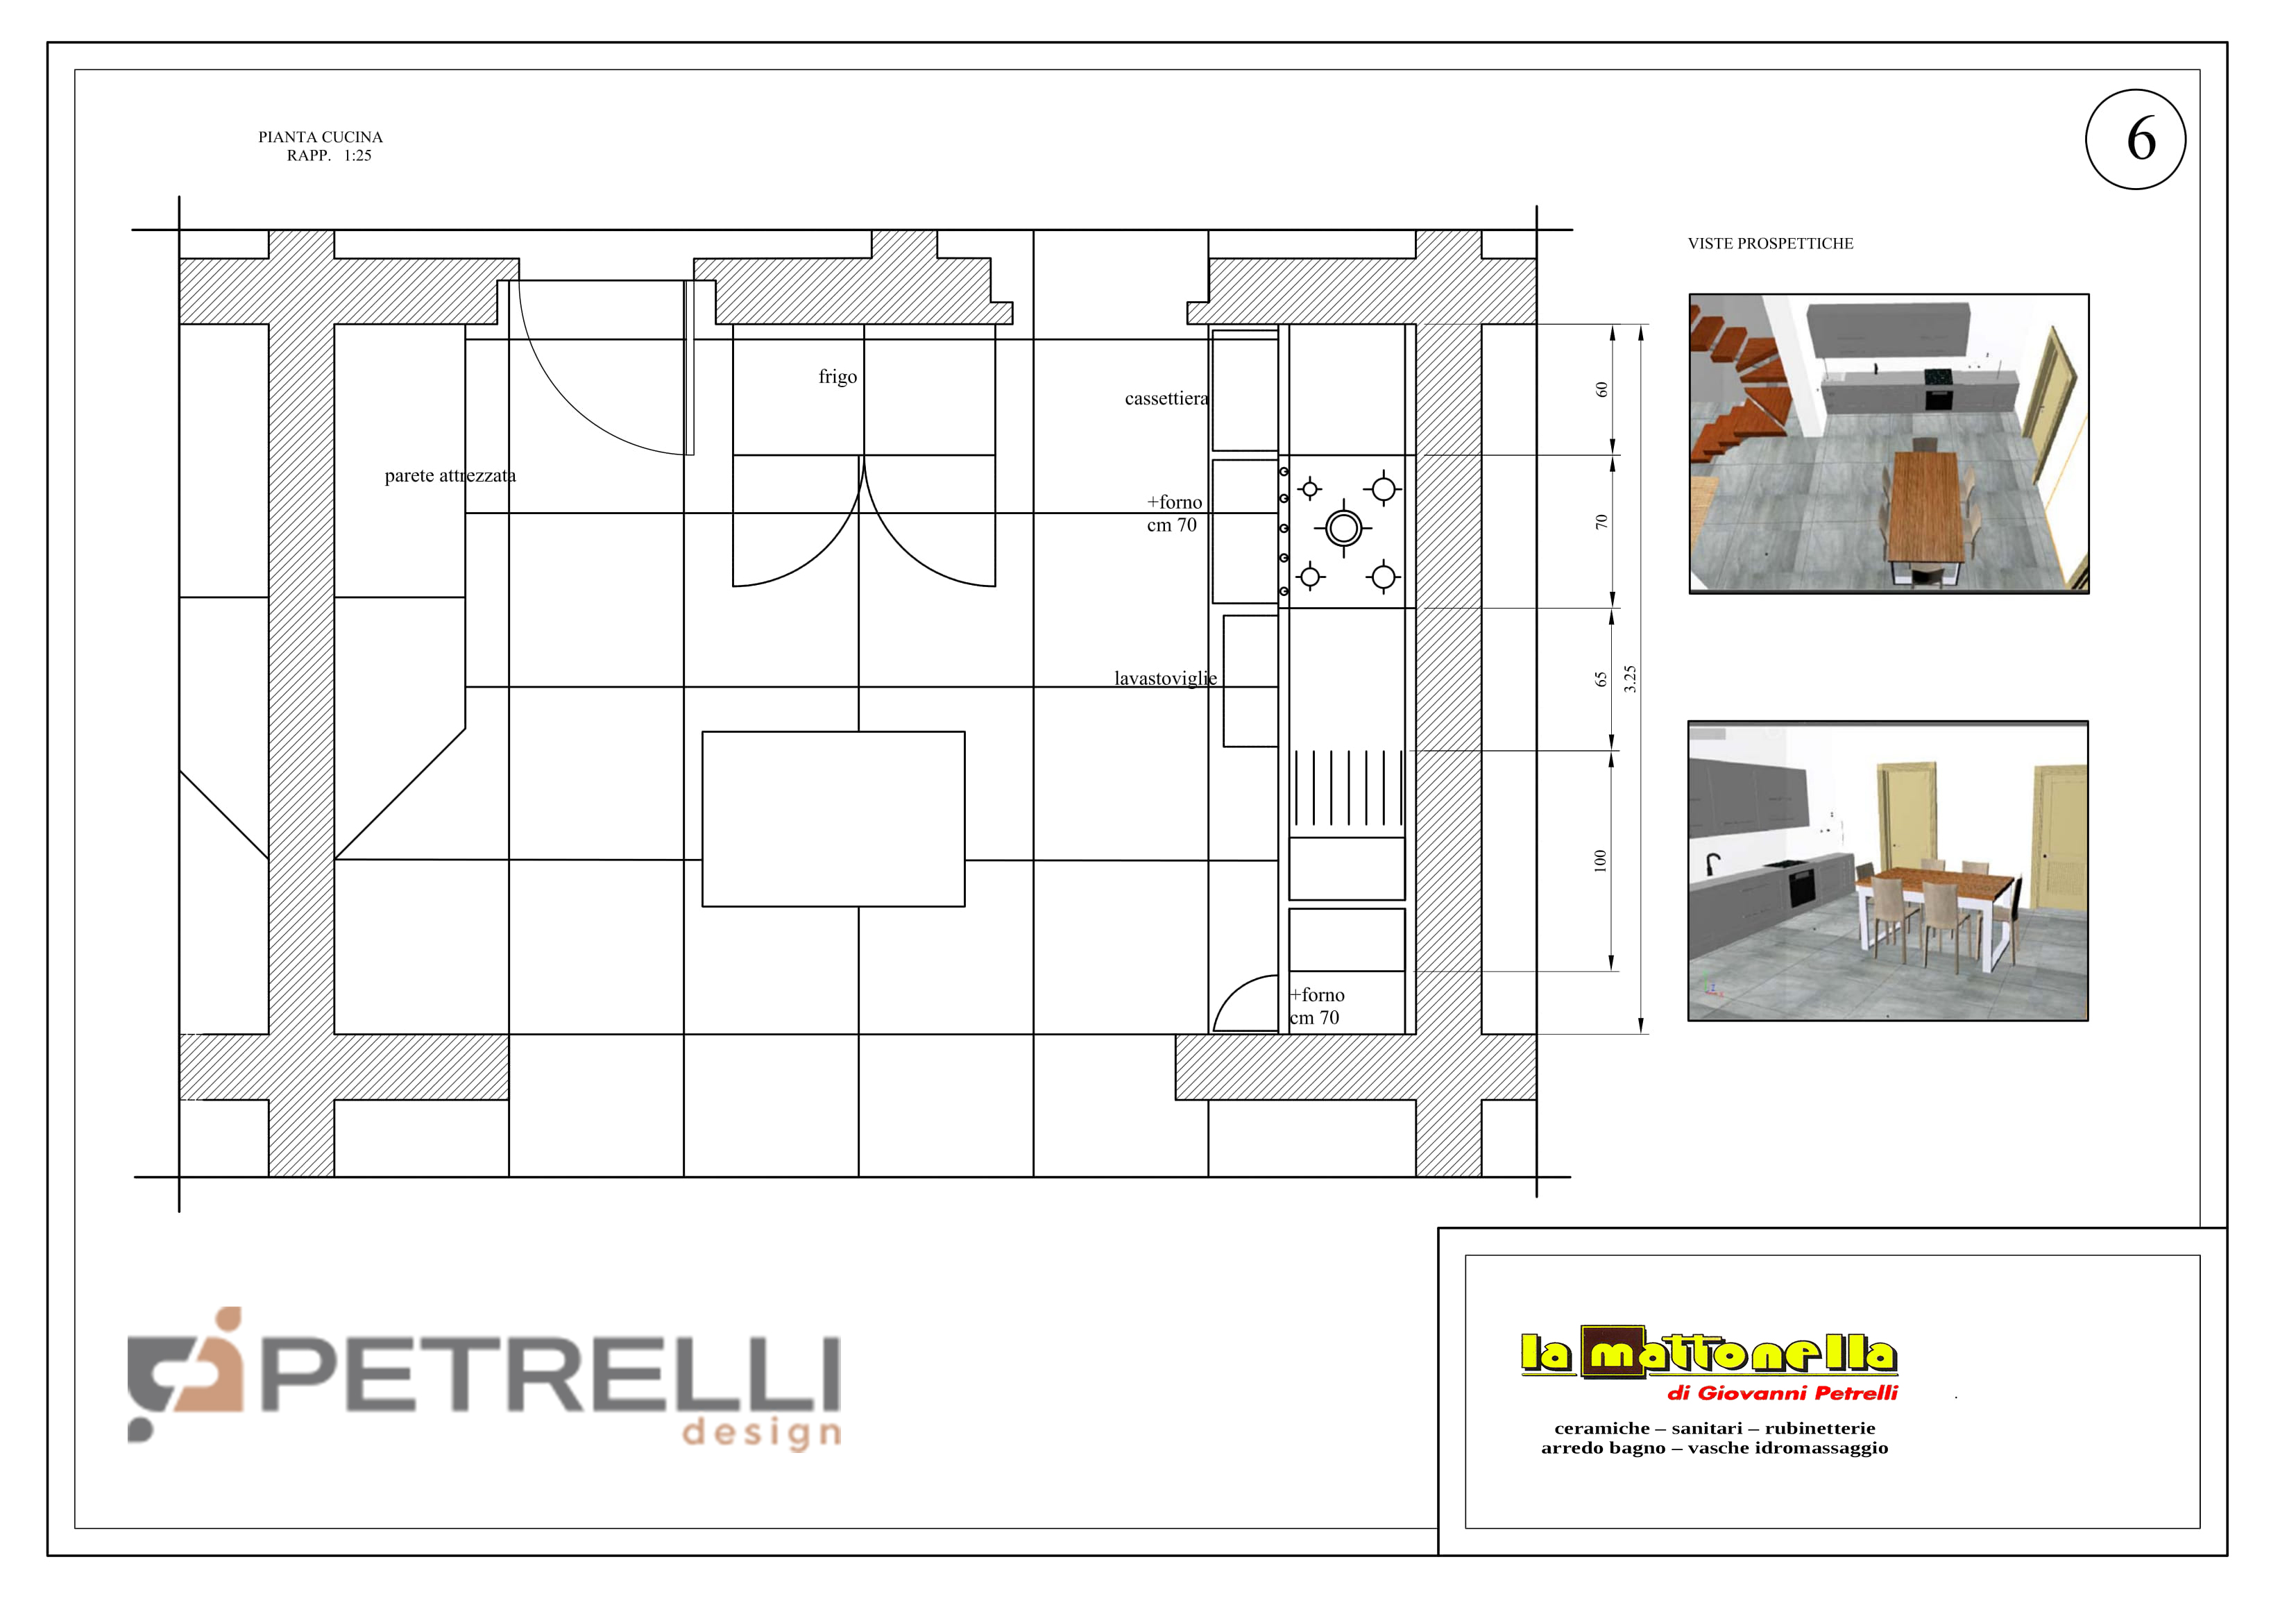 RistRutturatION 2 - Interior - 5 -PetrelliDesig